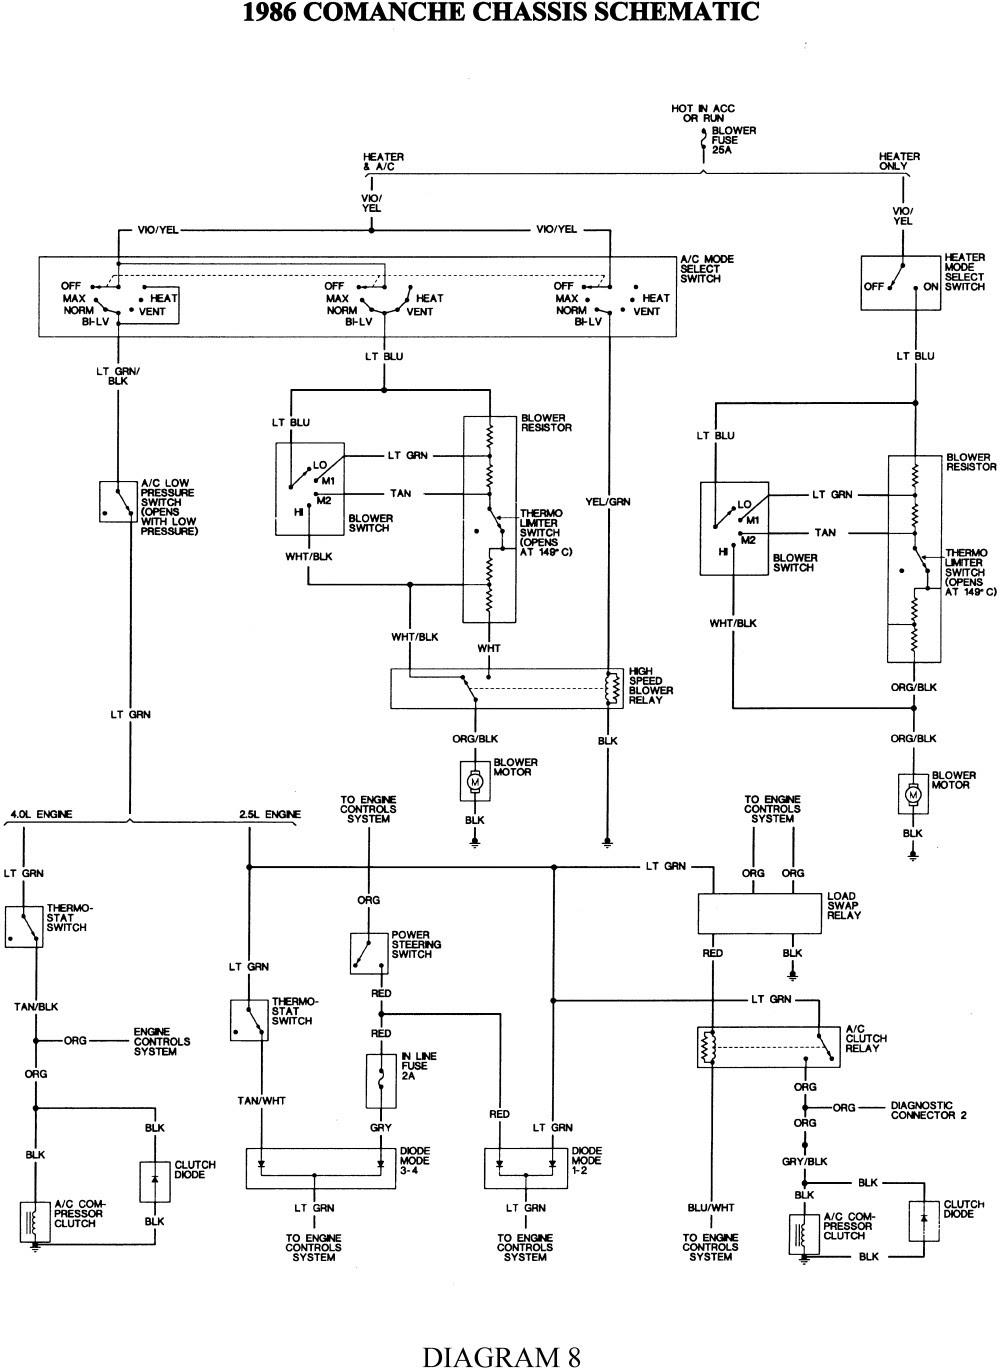 Diagram 2013 F 150 Dome Light Wiring Diagram Full Version Hd Quality Wiring Diagram Sitexbenz Fattoriagarbole It